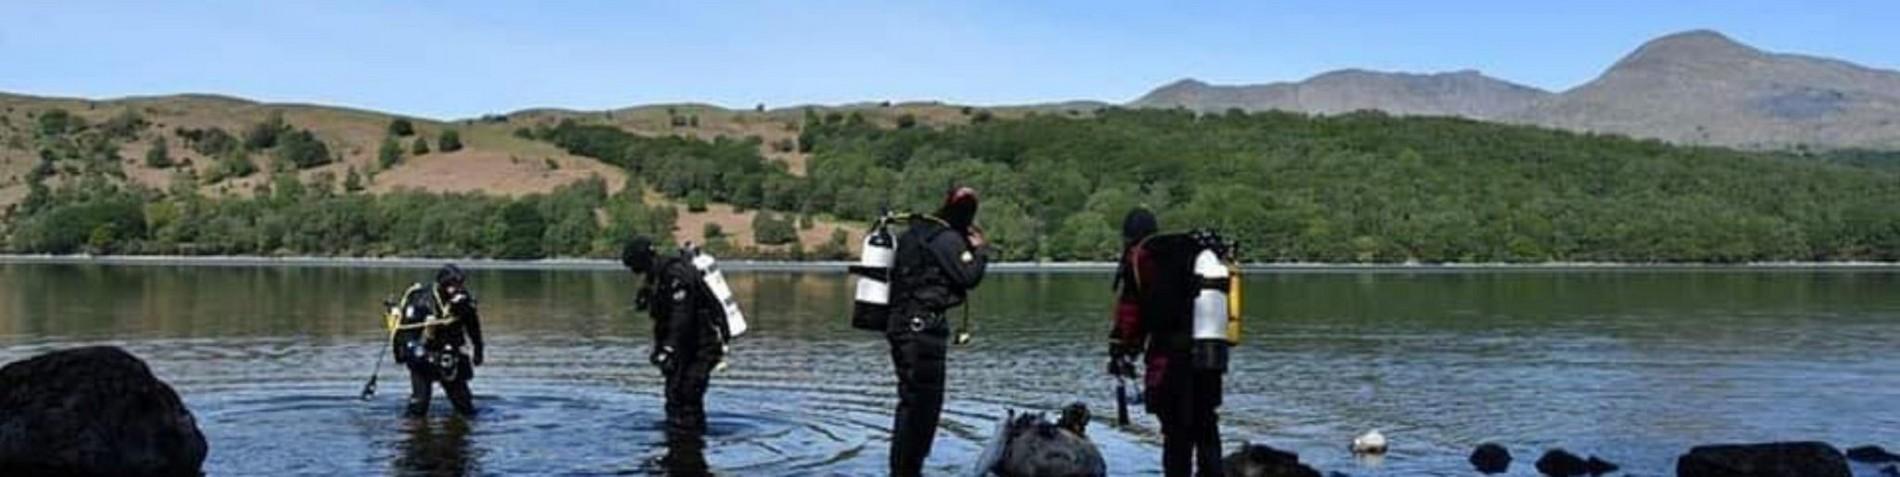 Bailiff Wood Dive Site